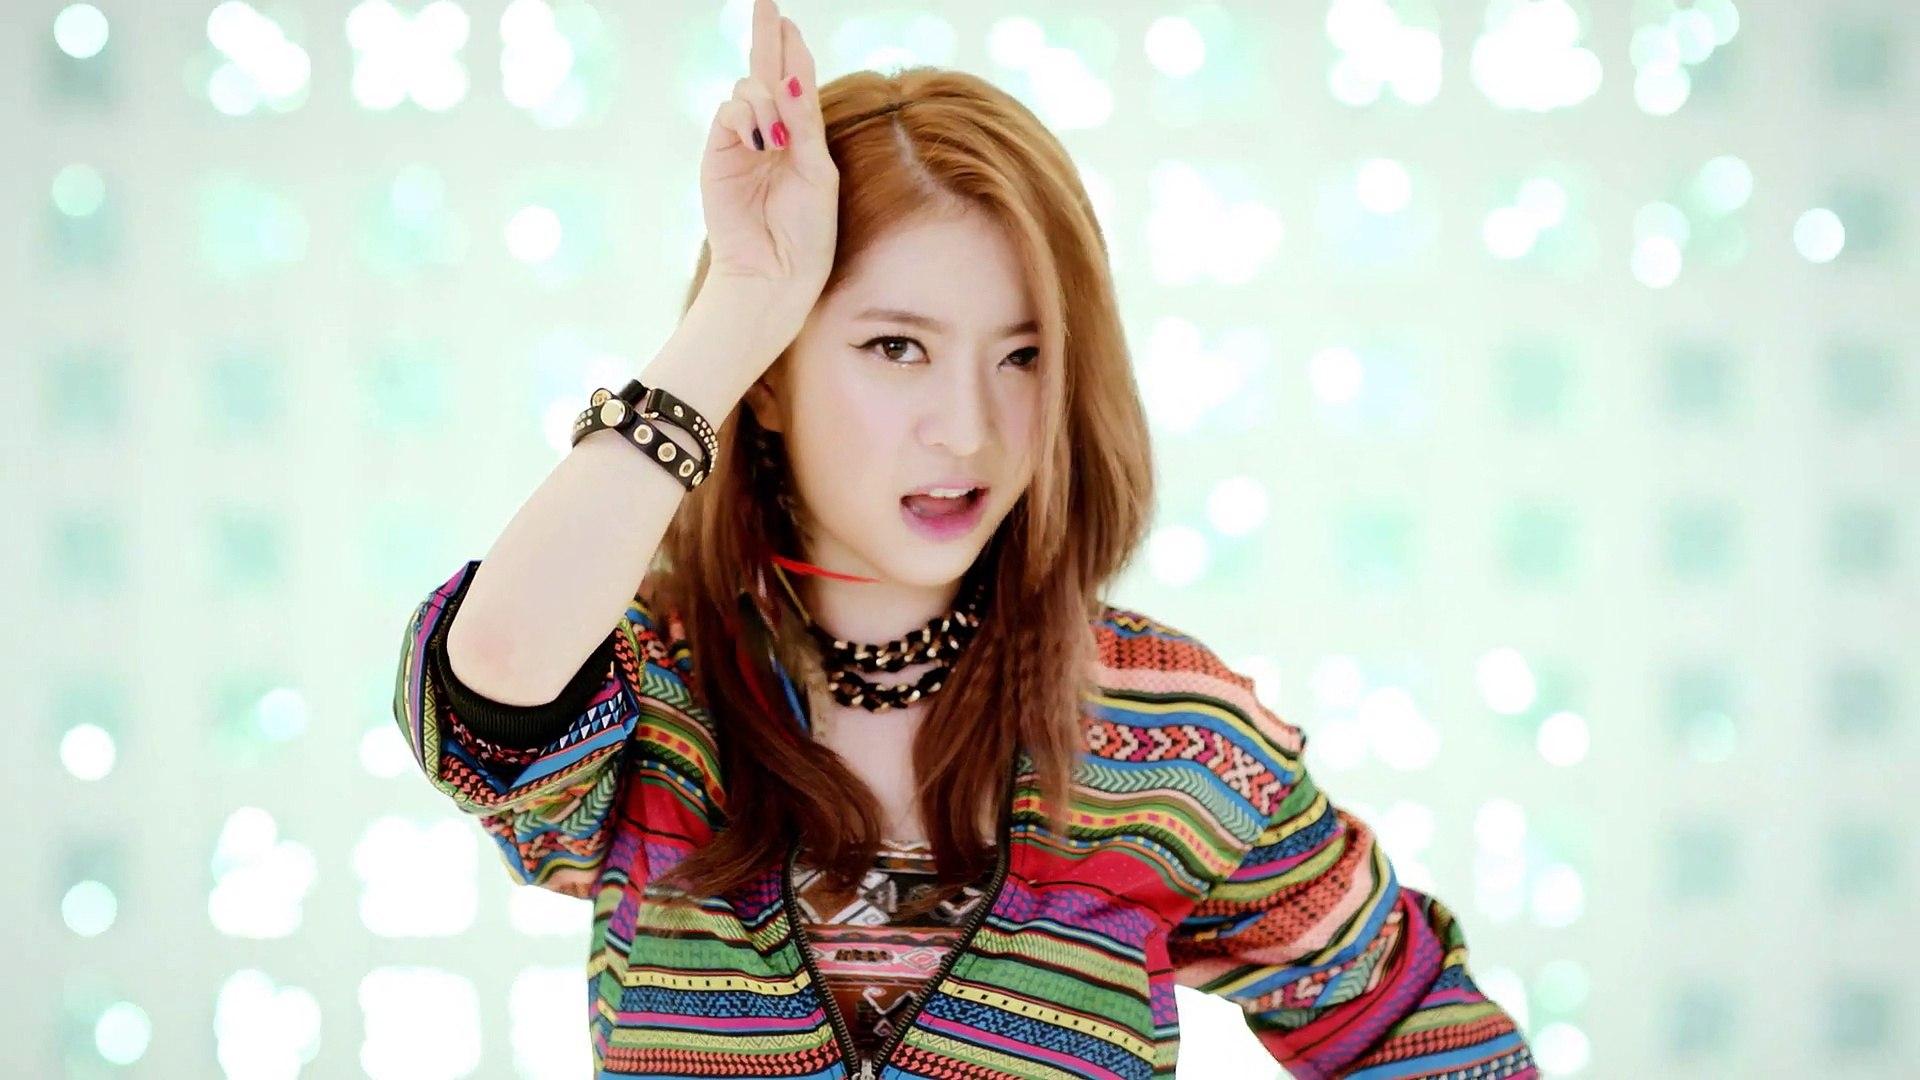 korea song k-pop praid musicvideo